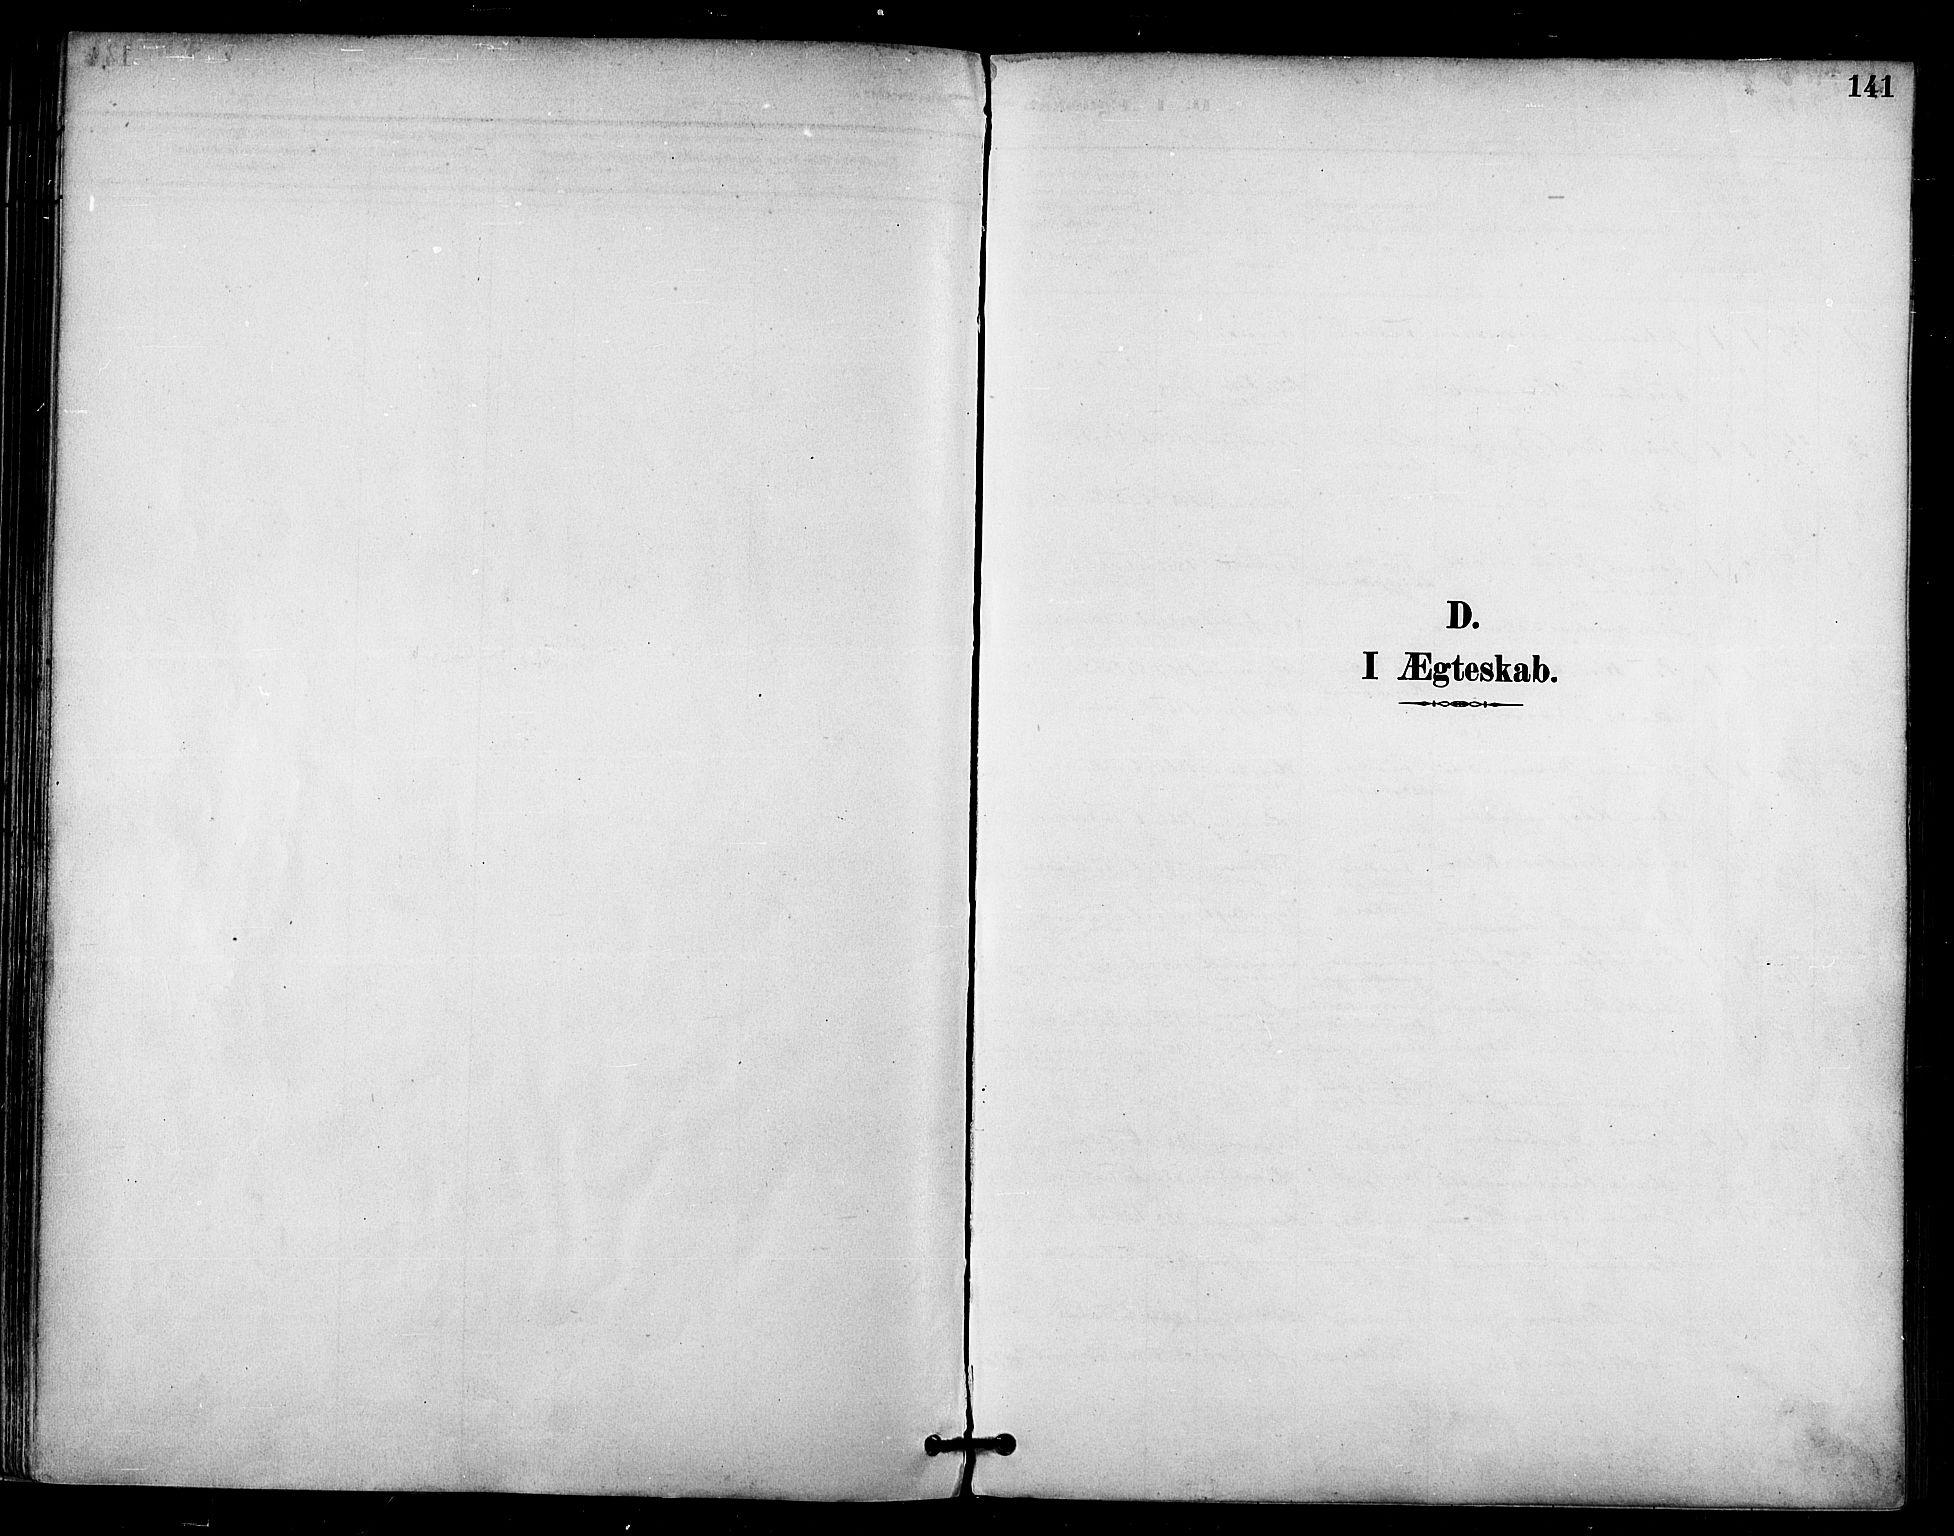 SATØ, Talvik sokneprestkontor, H/Ha/L0013kirke: Ministerialbok nr. 13, 1886-1897, s. 141